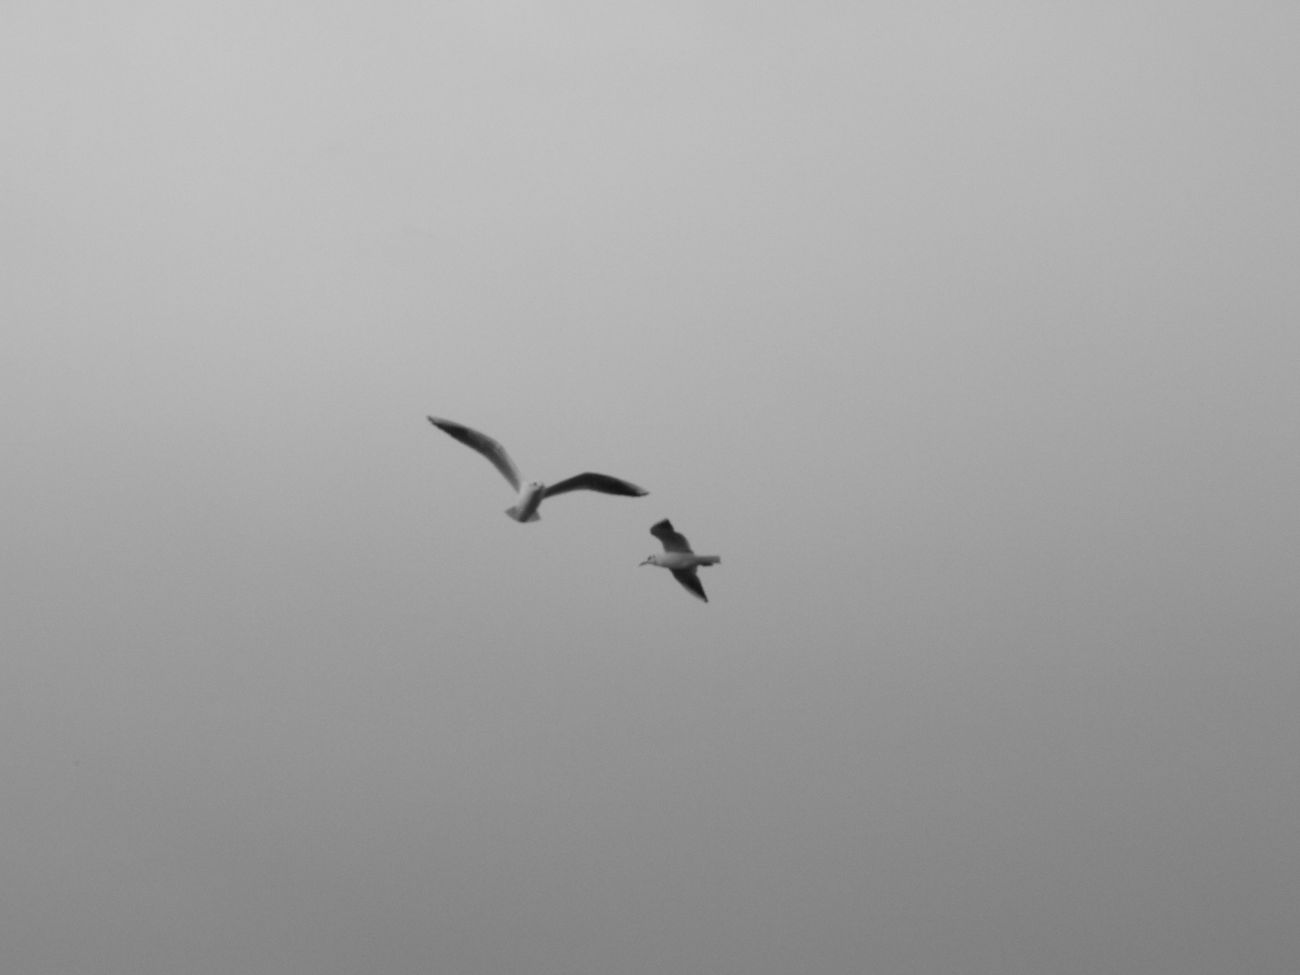 Seagulls Skyporn Freedom Airphotography Blackandwhite Netherlands Tholenski